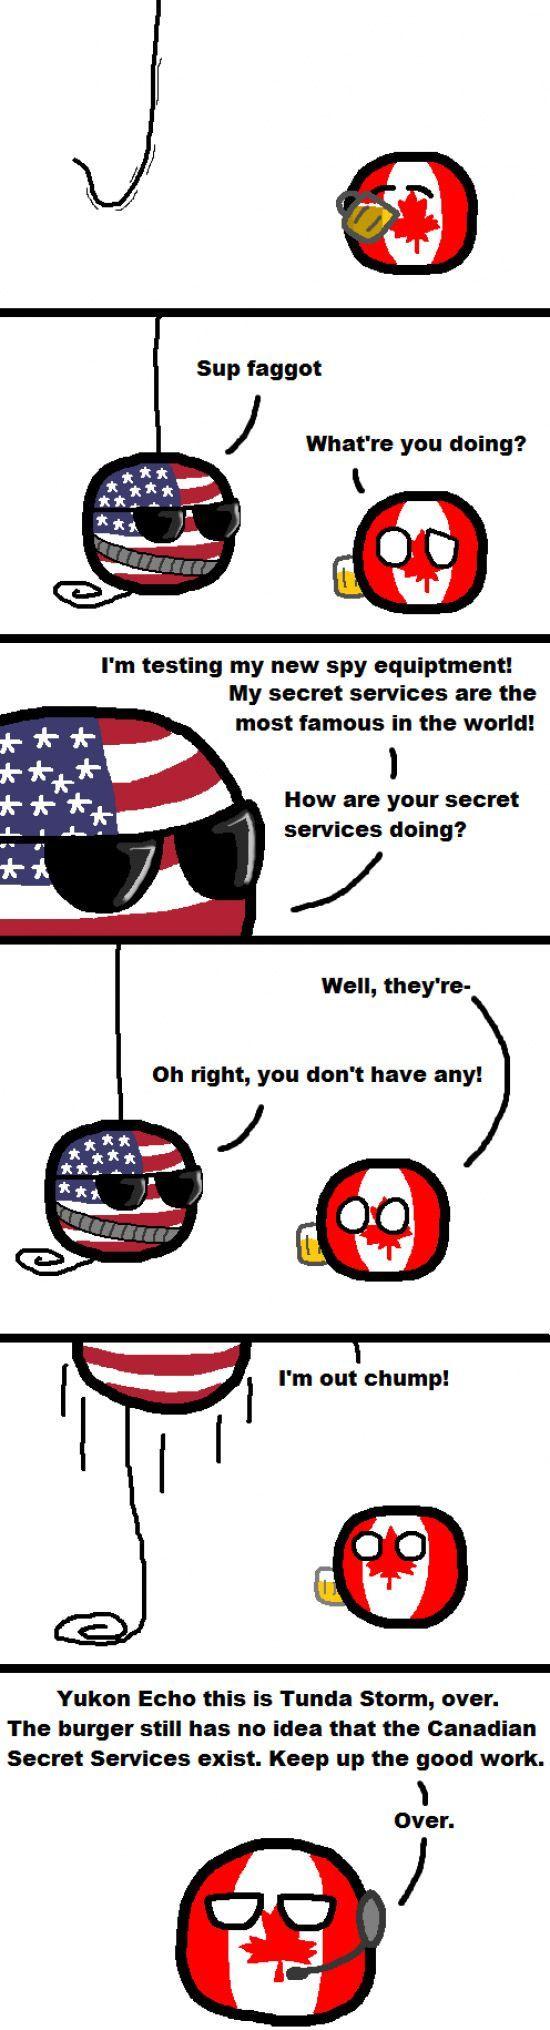 The Canadian Secret Service - 'the burger' ha